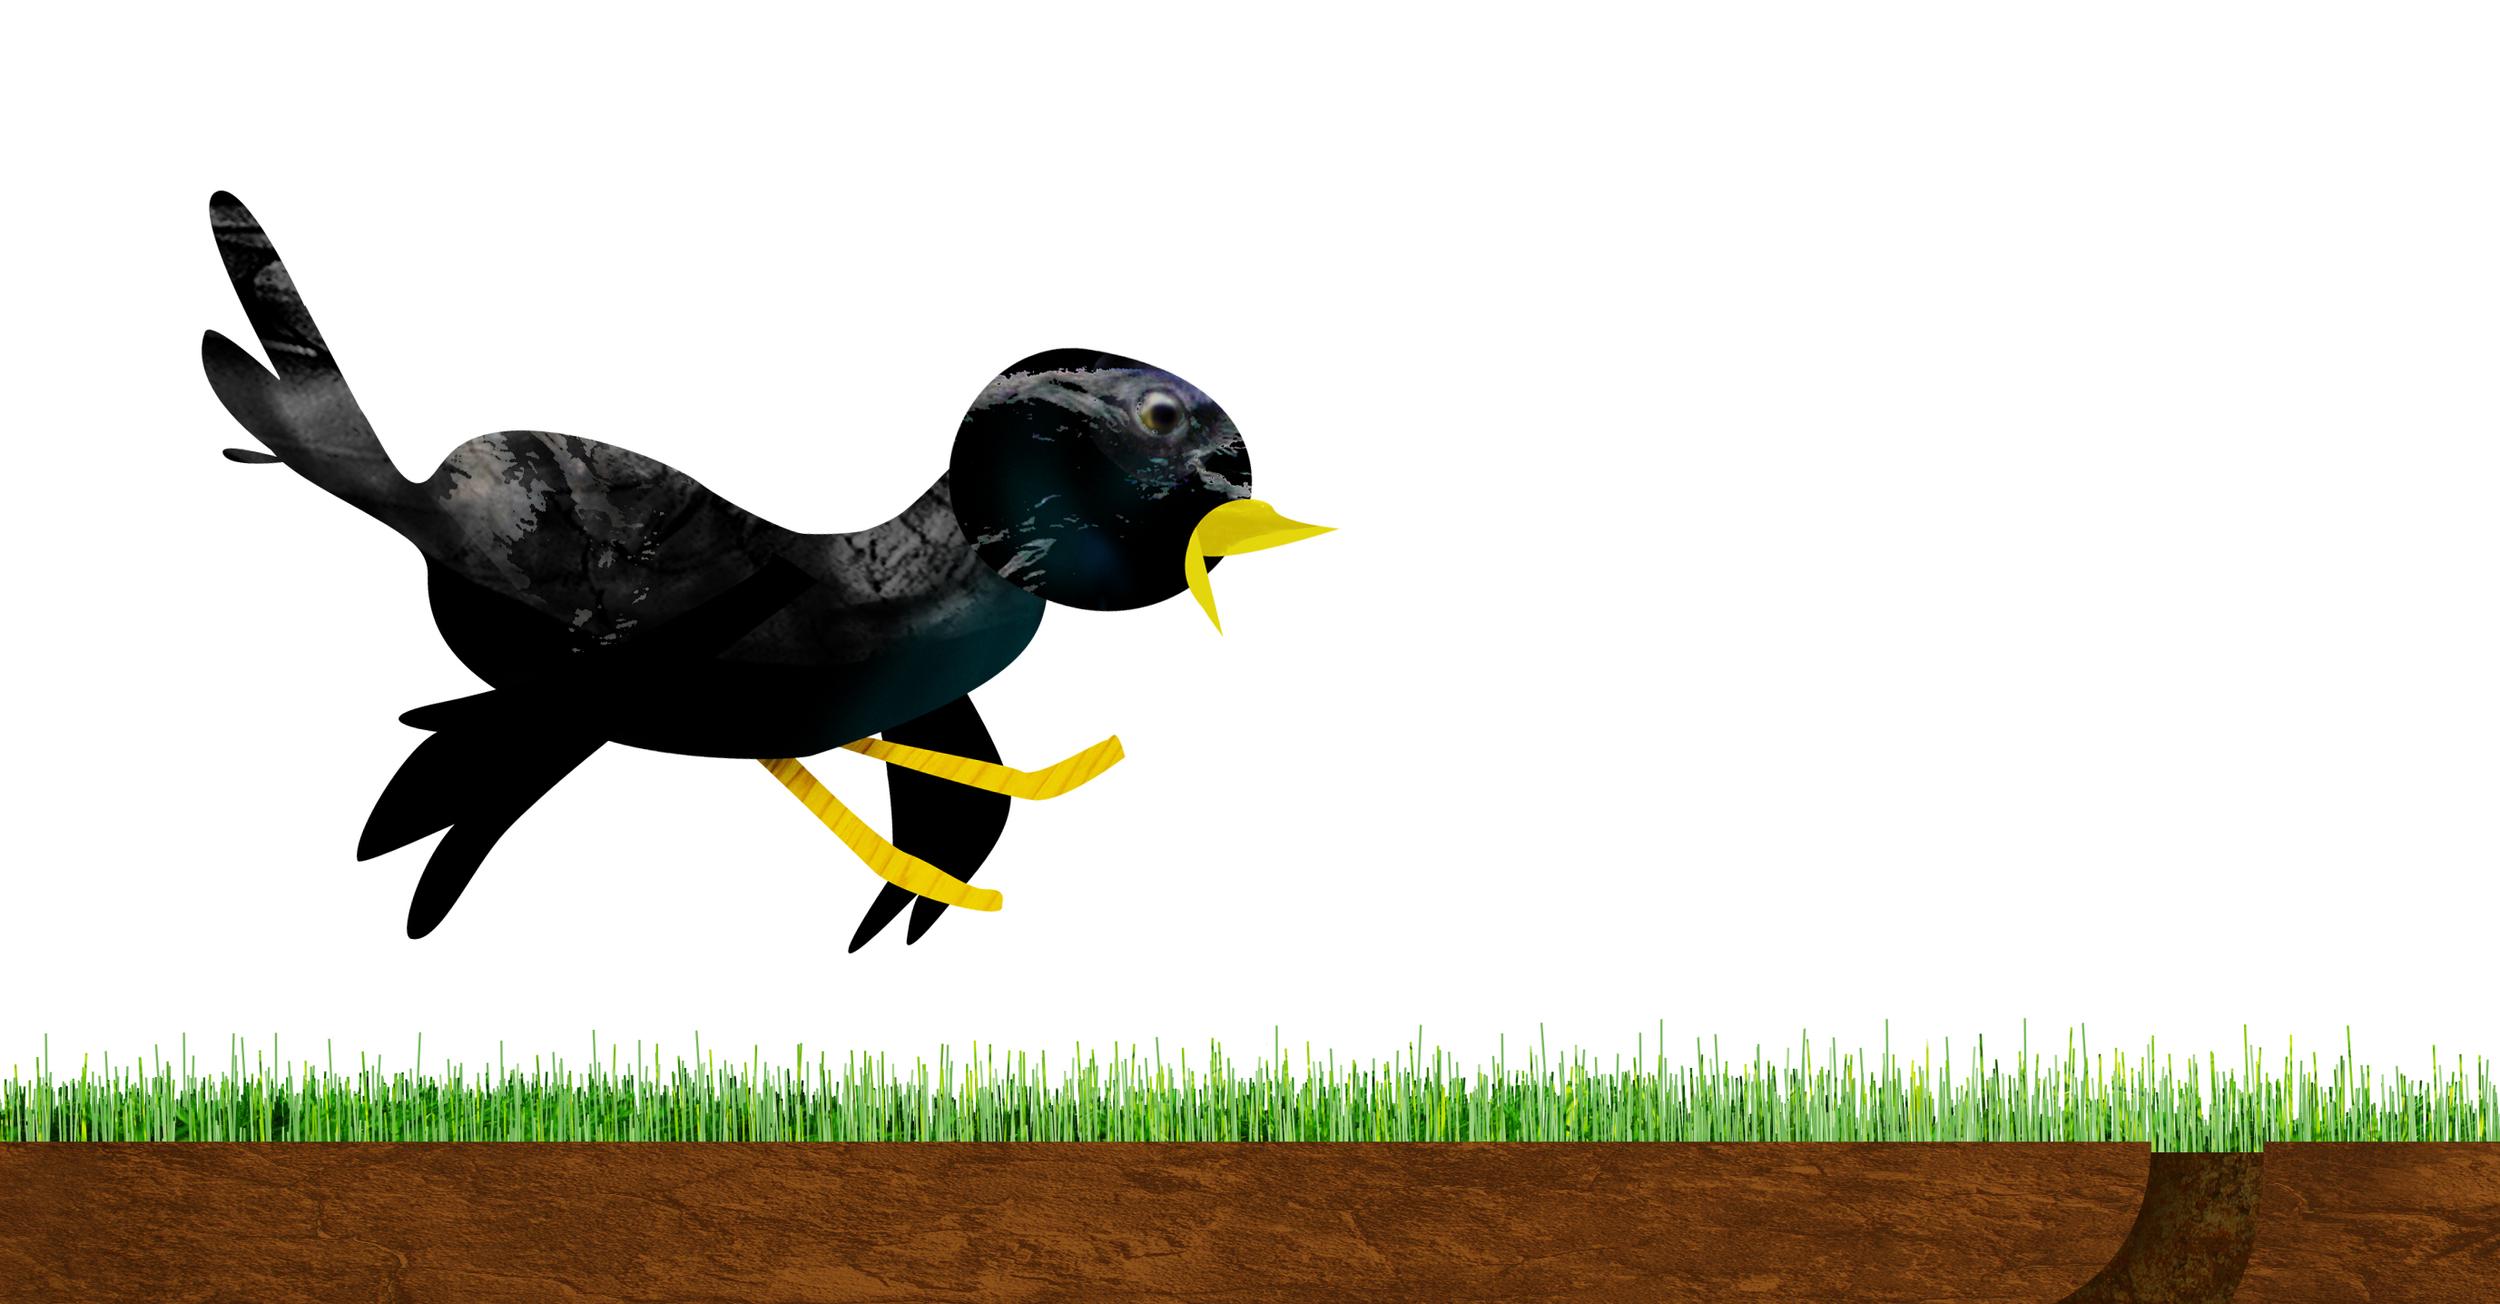 Click on the bird.